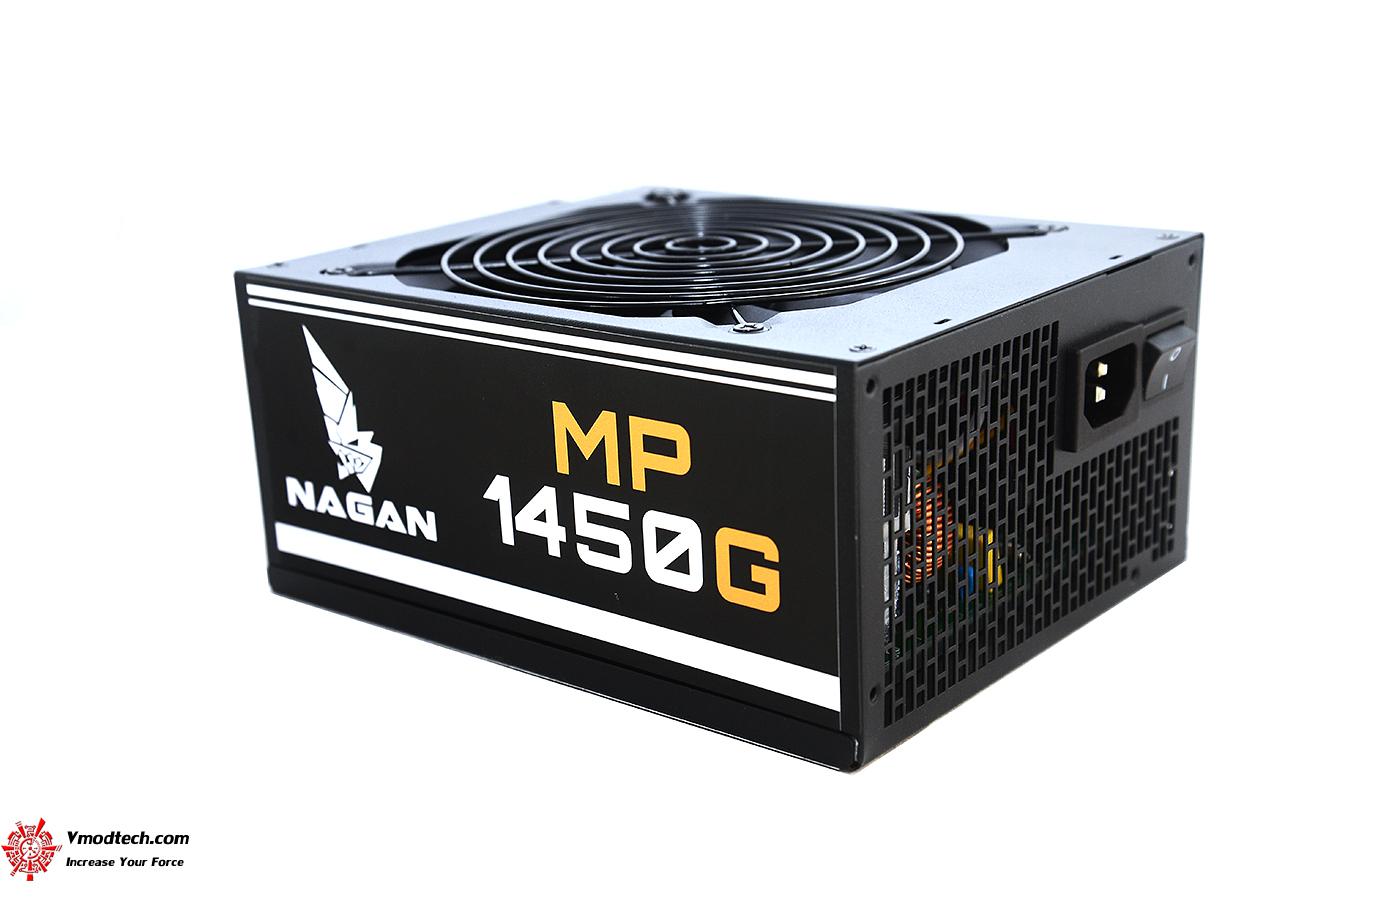 dsc 7272 NAGAN MP 1450G MINING POWER SUPPLY REVIEW